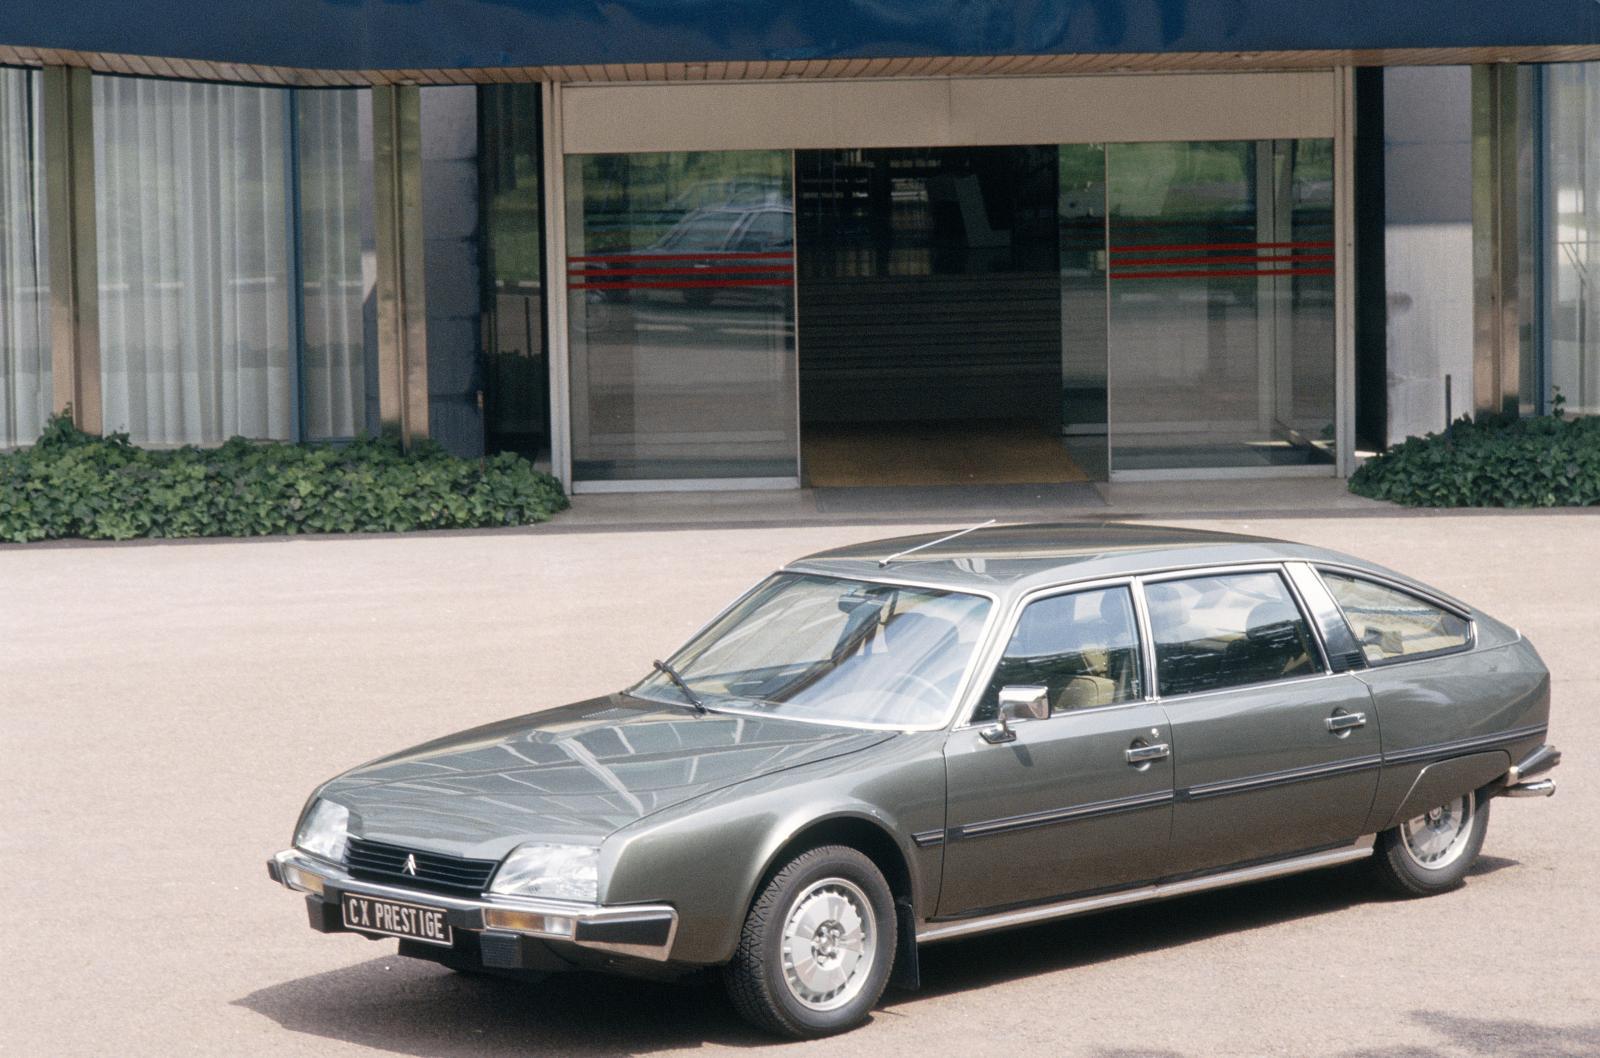 CX Prestige 1983